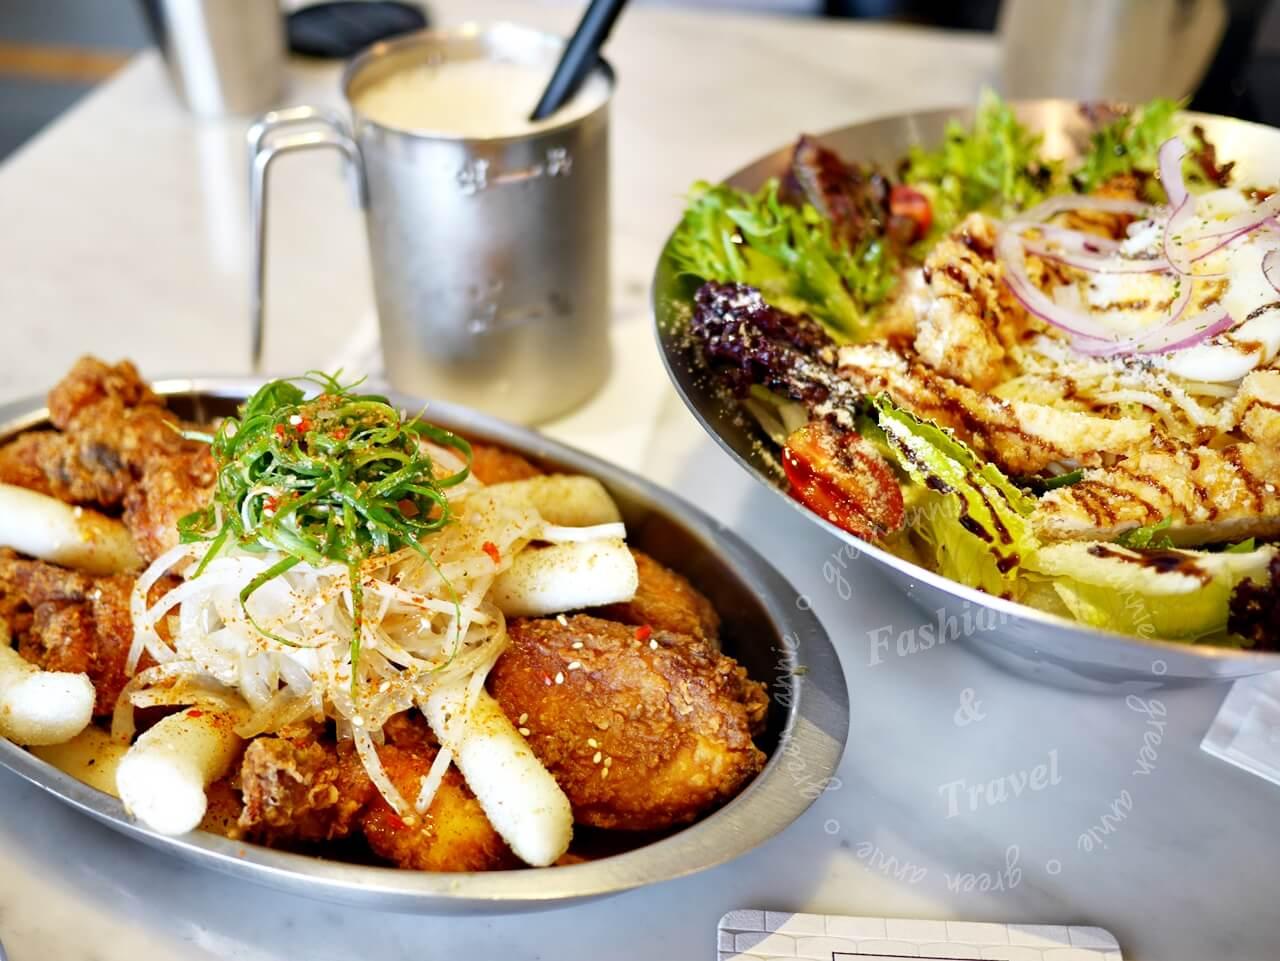 KATZ Fuison Restaurant 卡司複合式餐廳,韓式炸雞、美韓創料理,環境適合拍照-台中西區(精誠商圈)